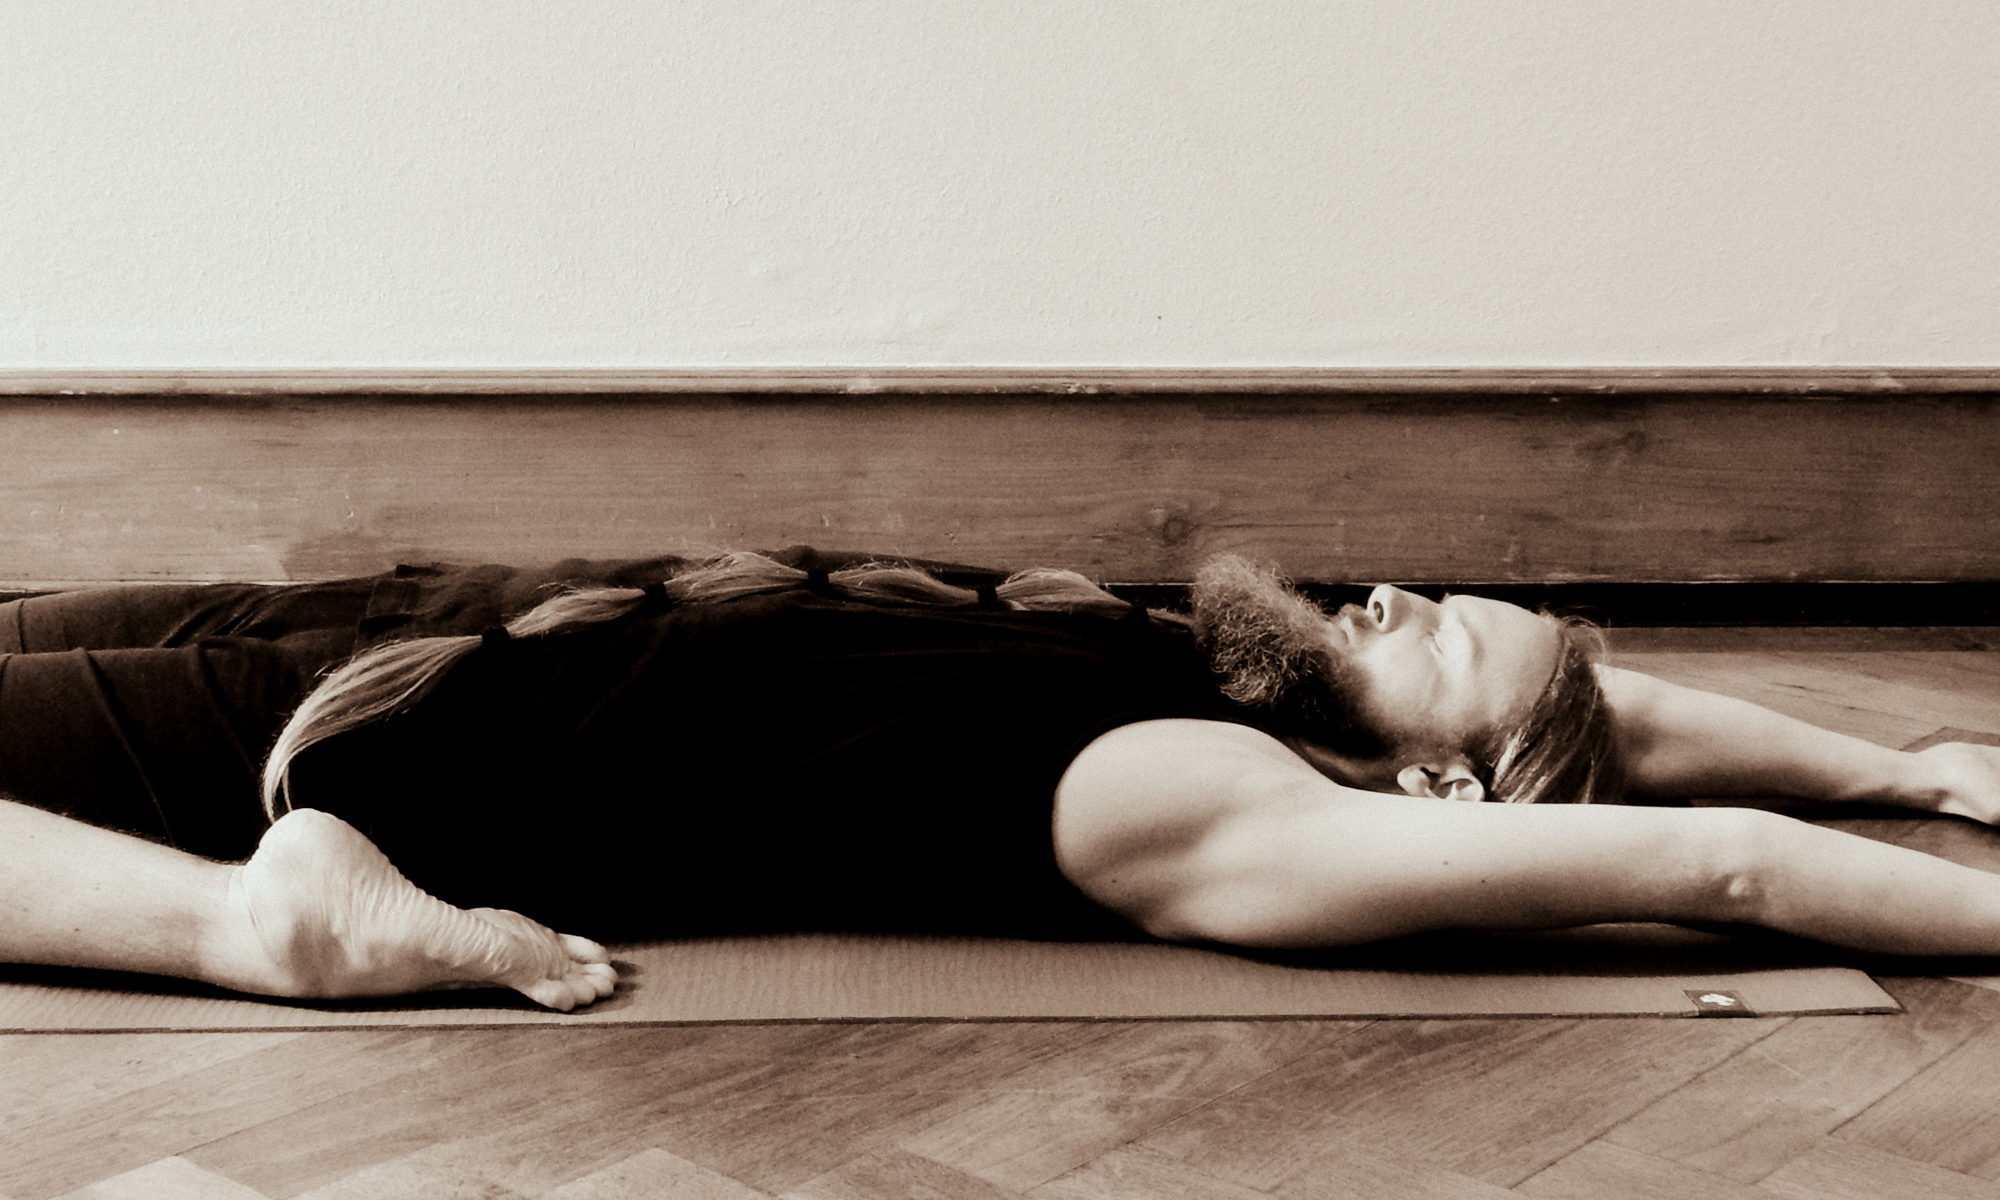 athaHatha Yoga Timo asana supta virasana